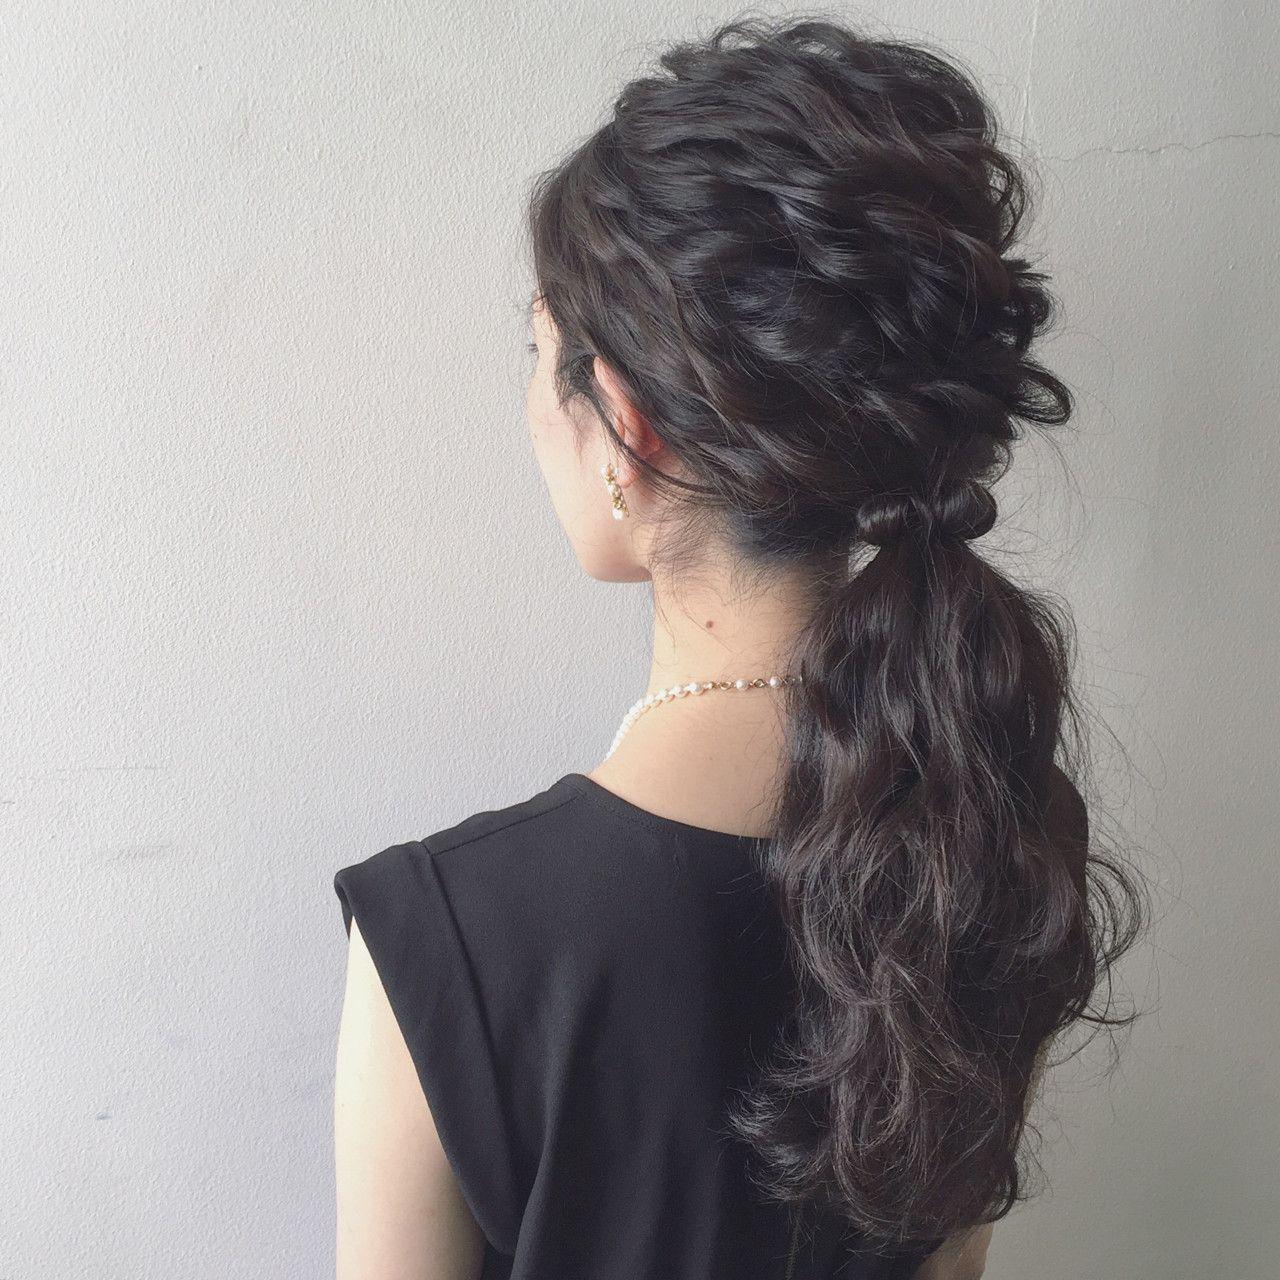 Kaneko Mayumi Hair Arrange 黒髪アレンジ 黒髪 ヘアアレンジ